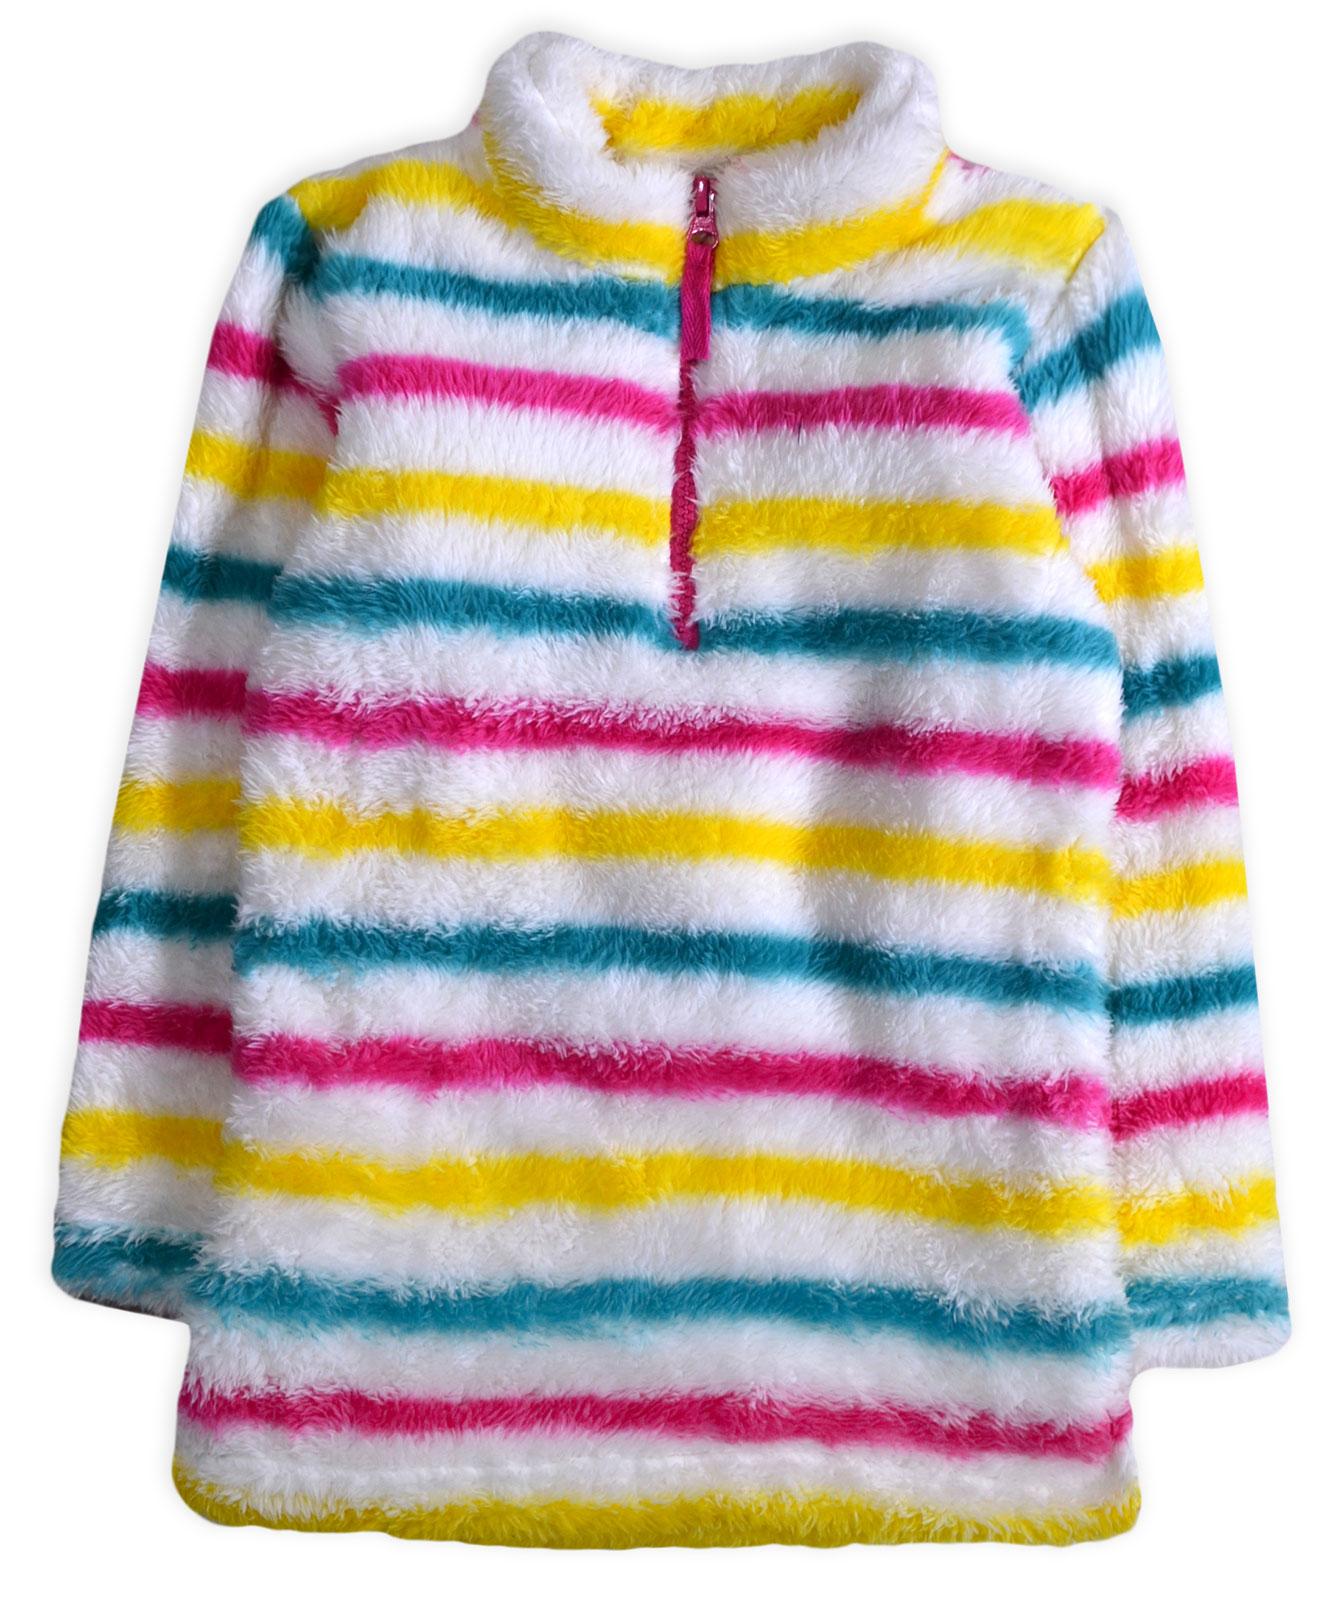 Kids-Fleece-Jumper-New-Boys-Girls-Stripe-Spot-Star-Pull-Over-Top-Ages-4-13-Yrs